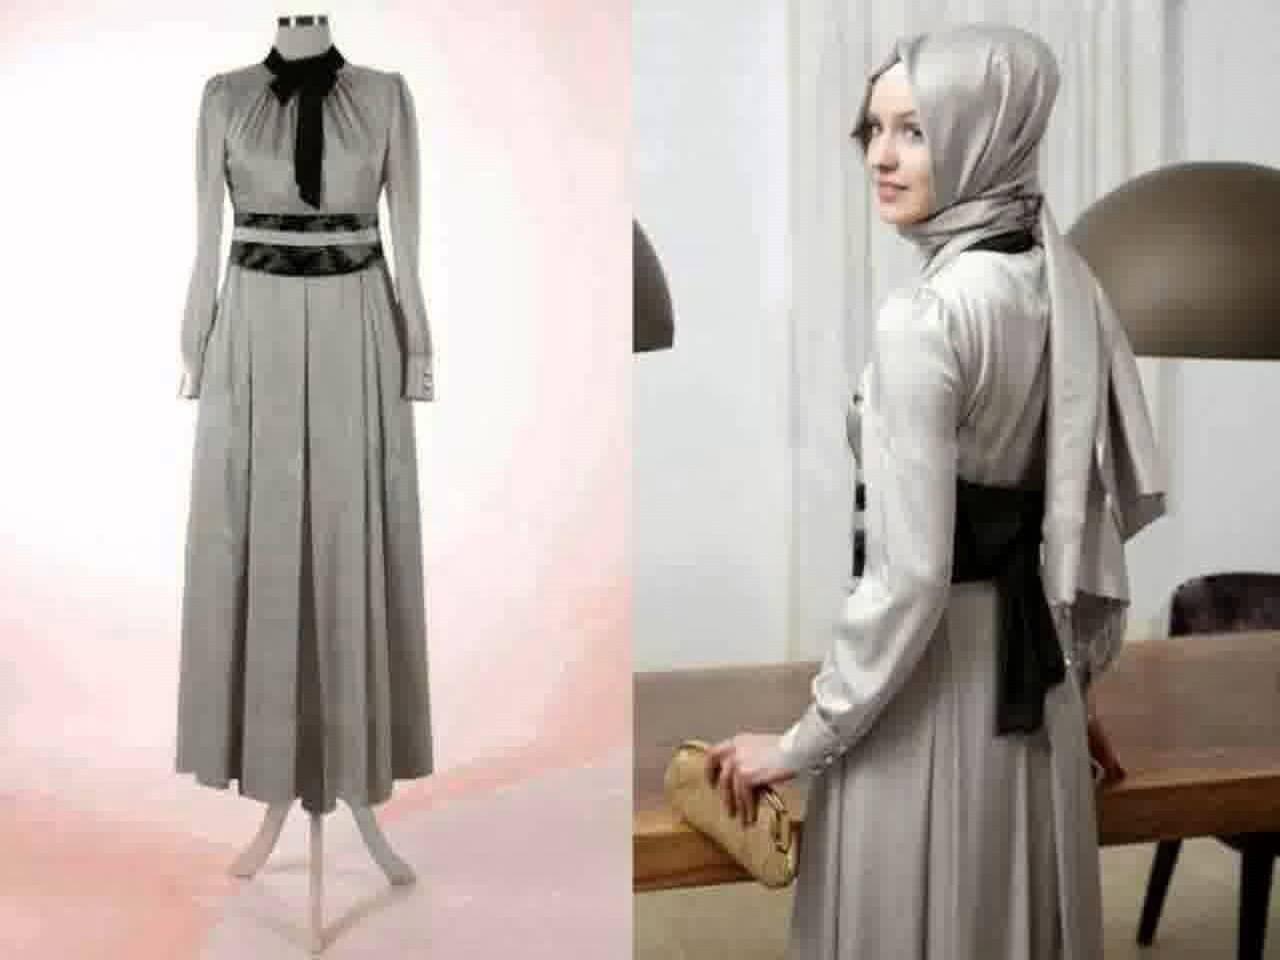 Design Model Baju Lebaran Idul Adha J7do 25 Model Baju Lebaran Terbaru Untuk Idul Fitri 2018